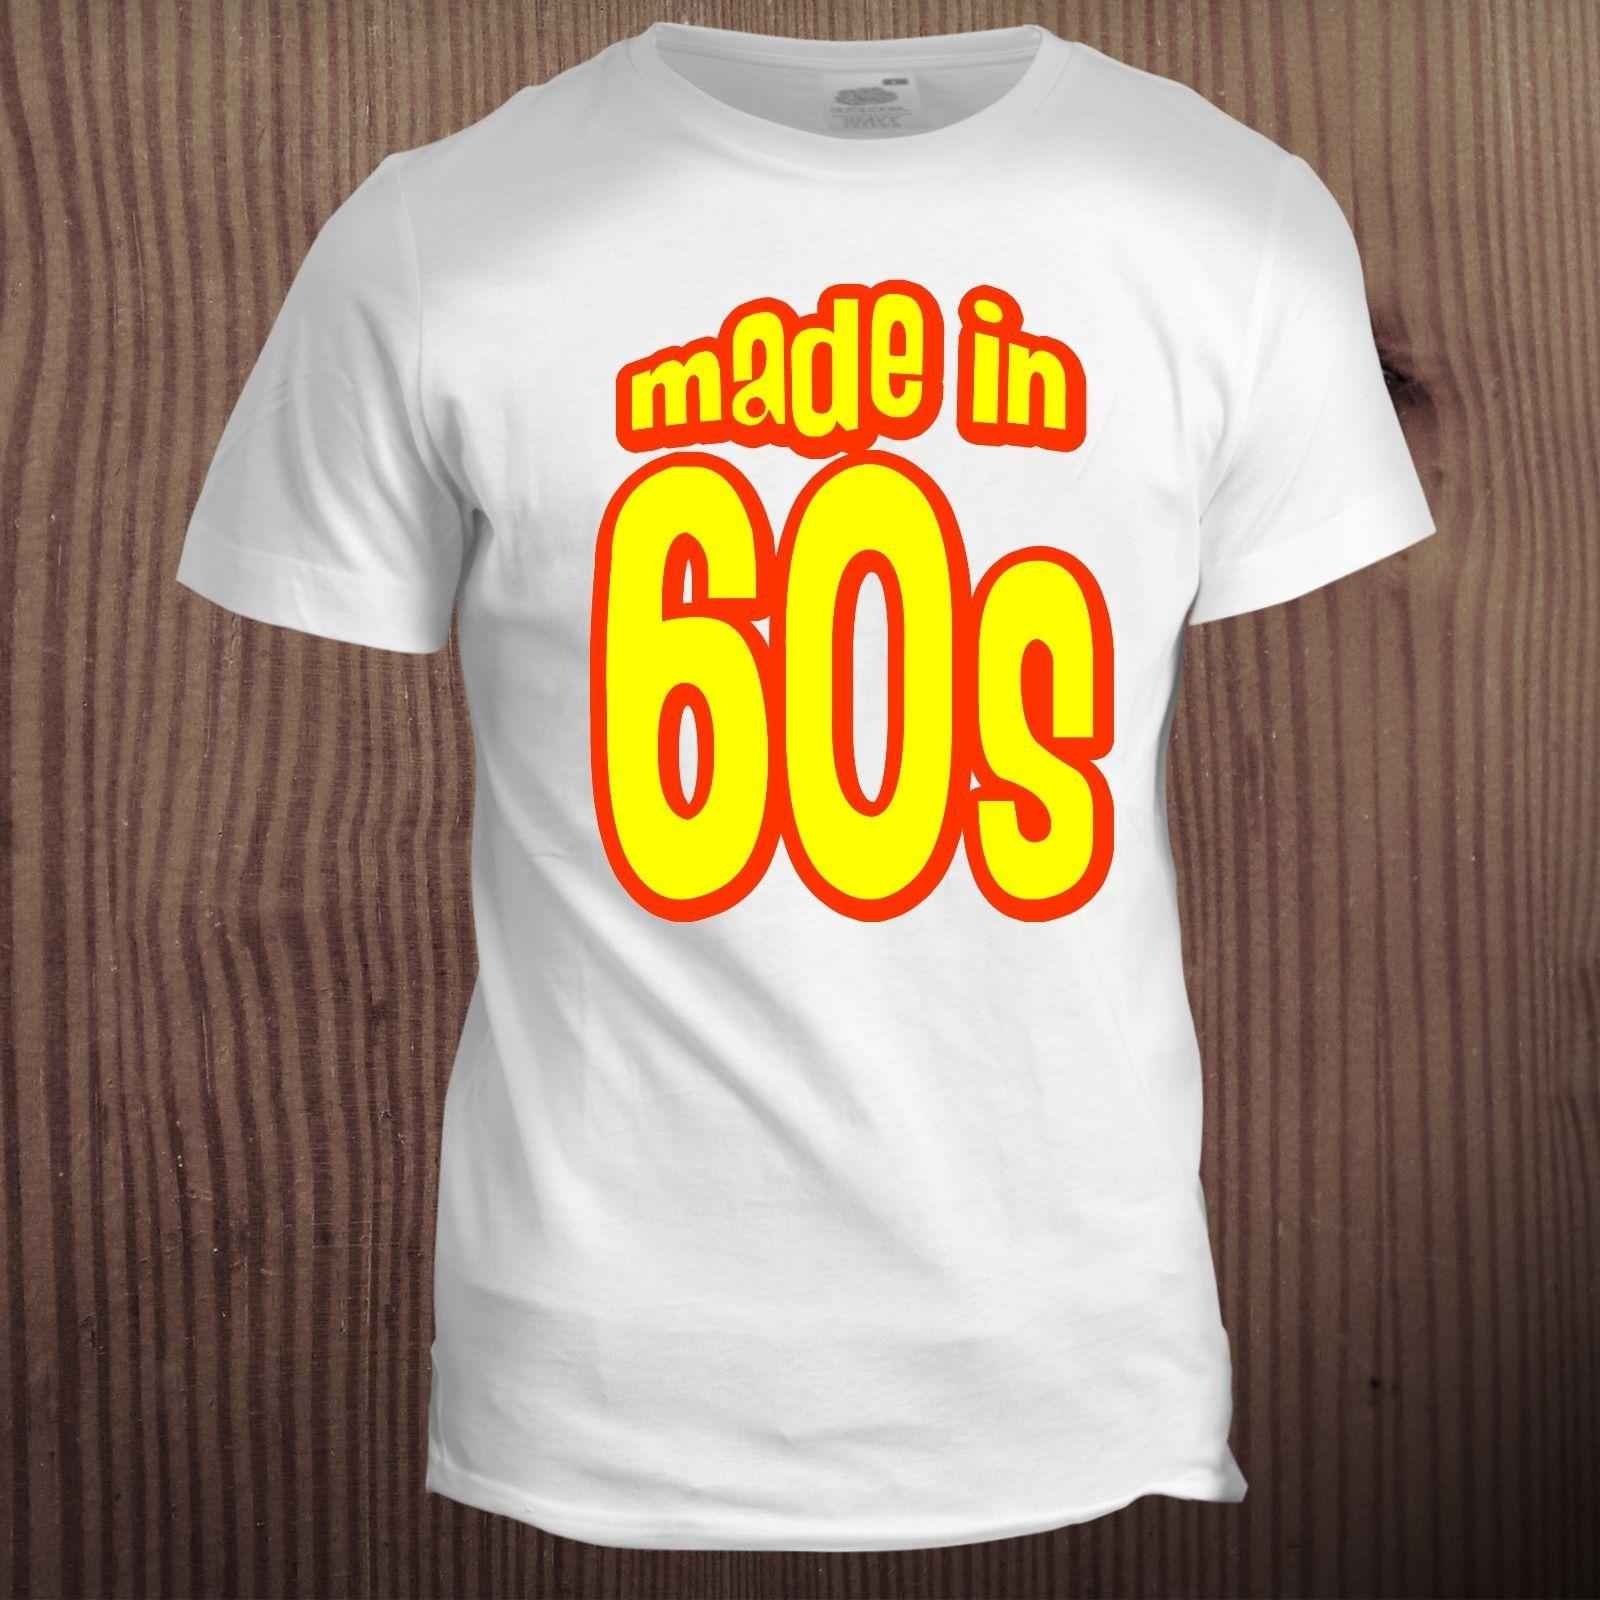 6b97da175 60s Dad Father Class T Shirt Funny T Shirt Hipster Round Neck Man'S Funny T  Shirt Companies Designer Mens T Shirt From Fenditeeshirt, $11.54  DHgate.Com